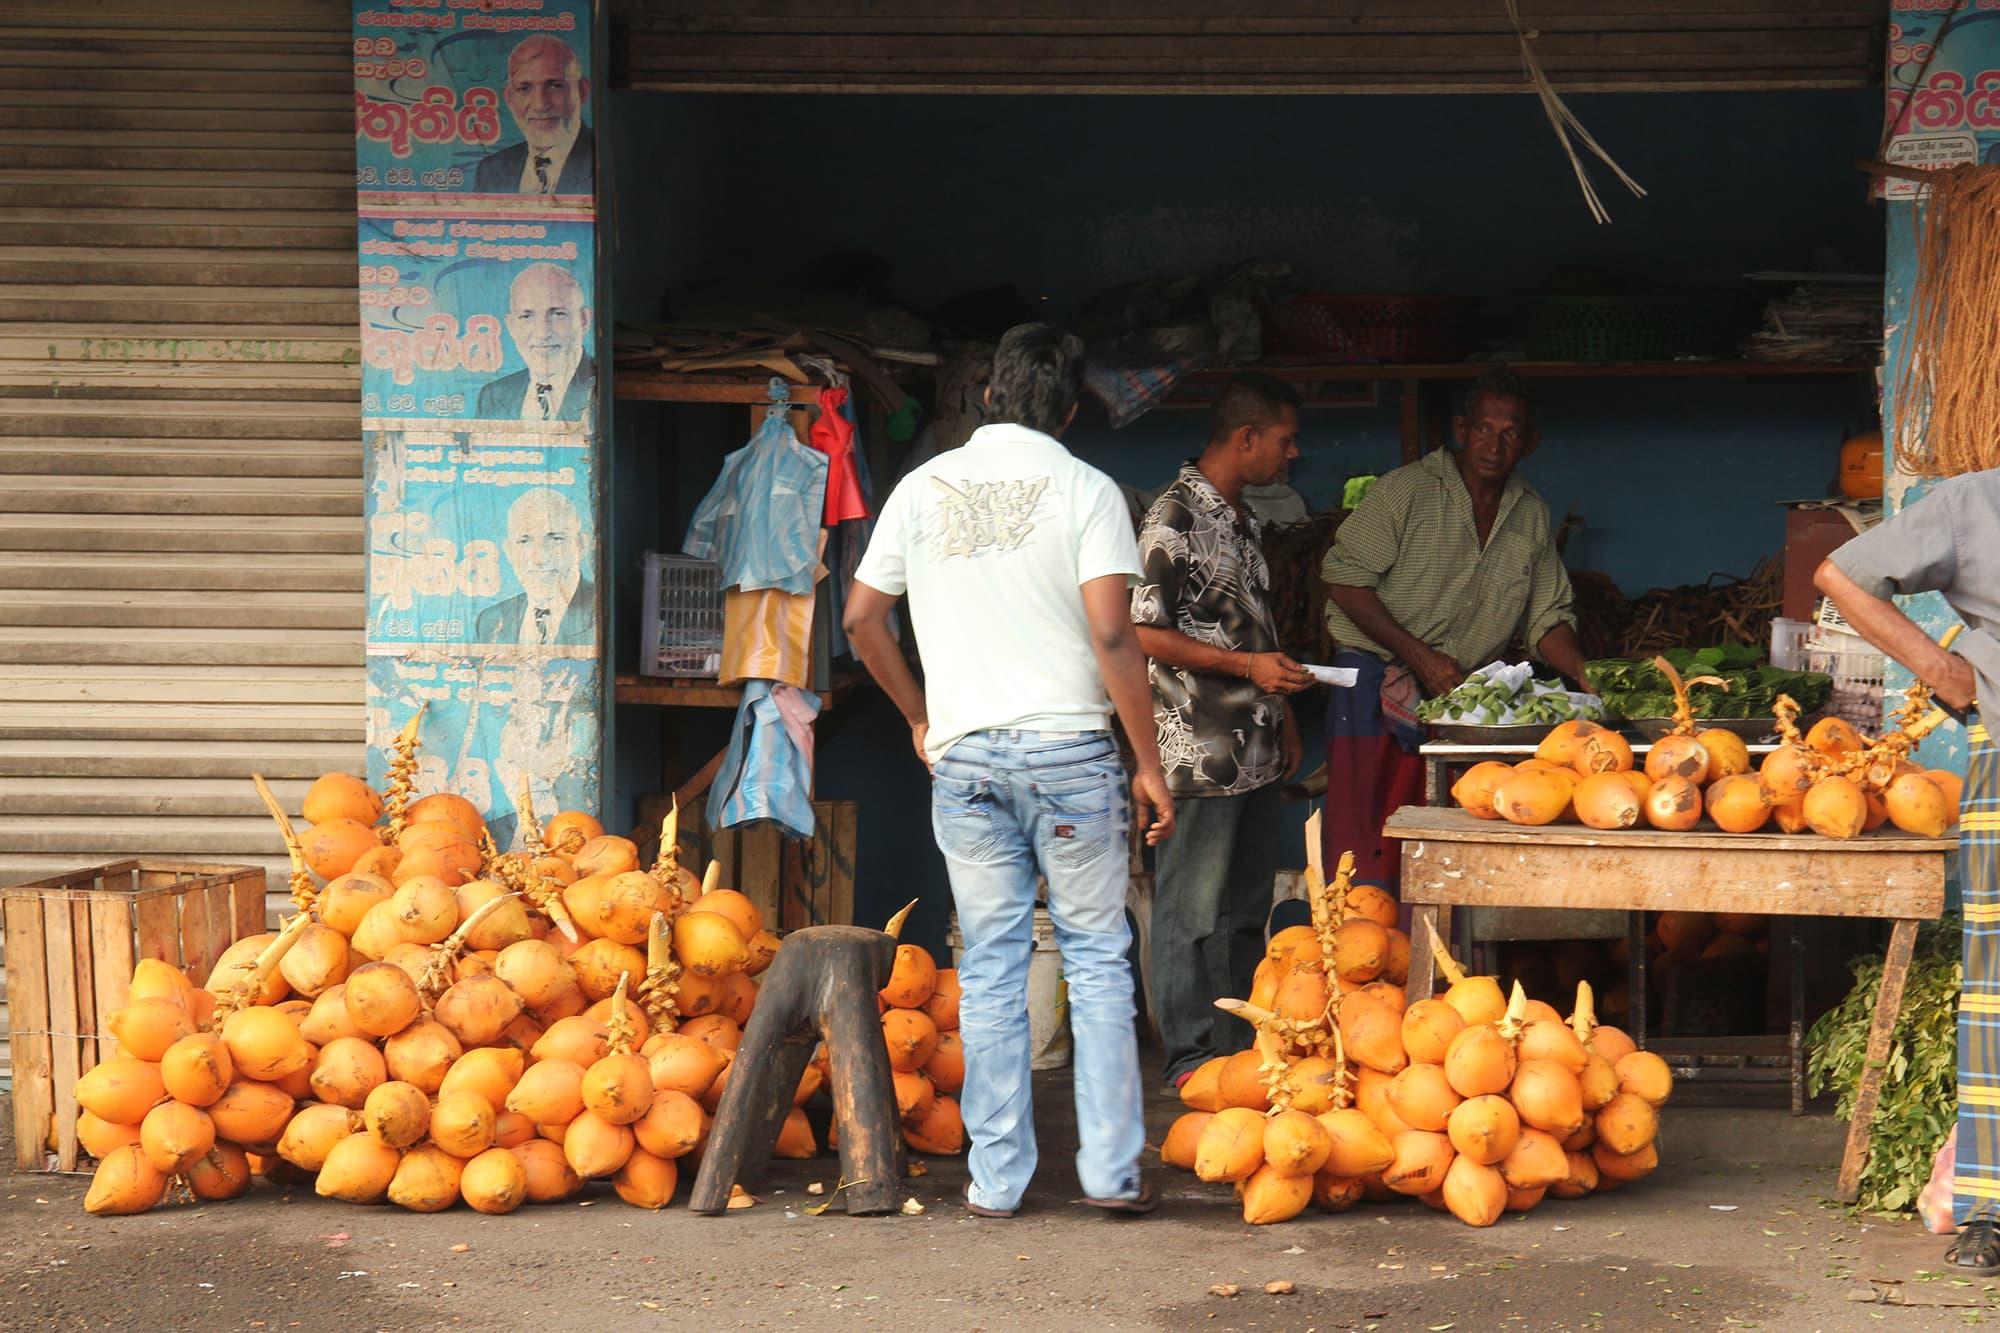 Locals barter over fruit in a market in sri Lanka